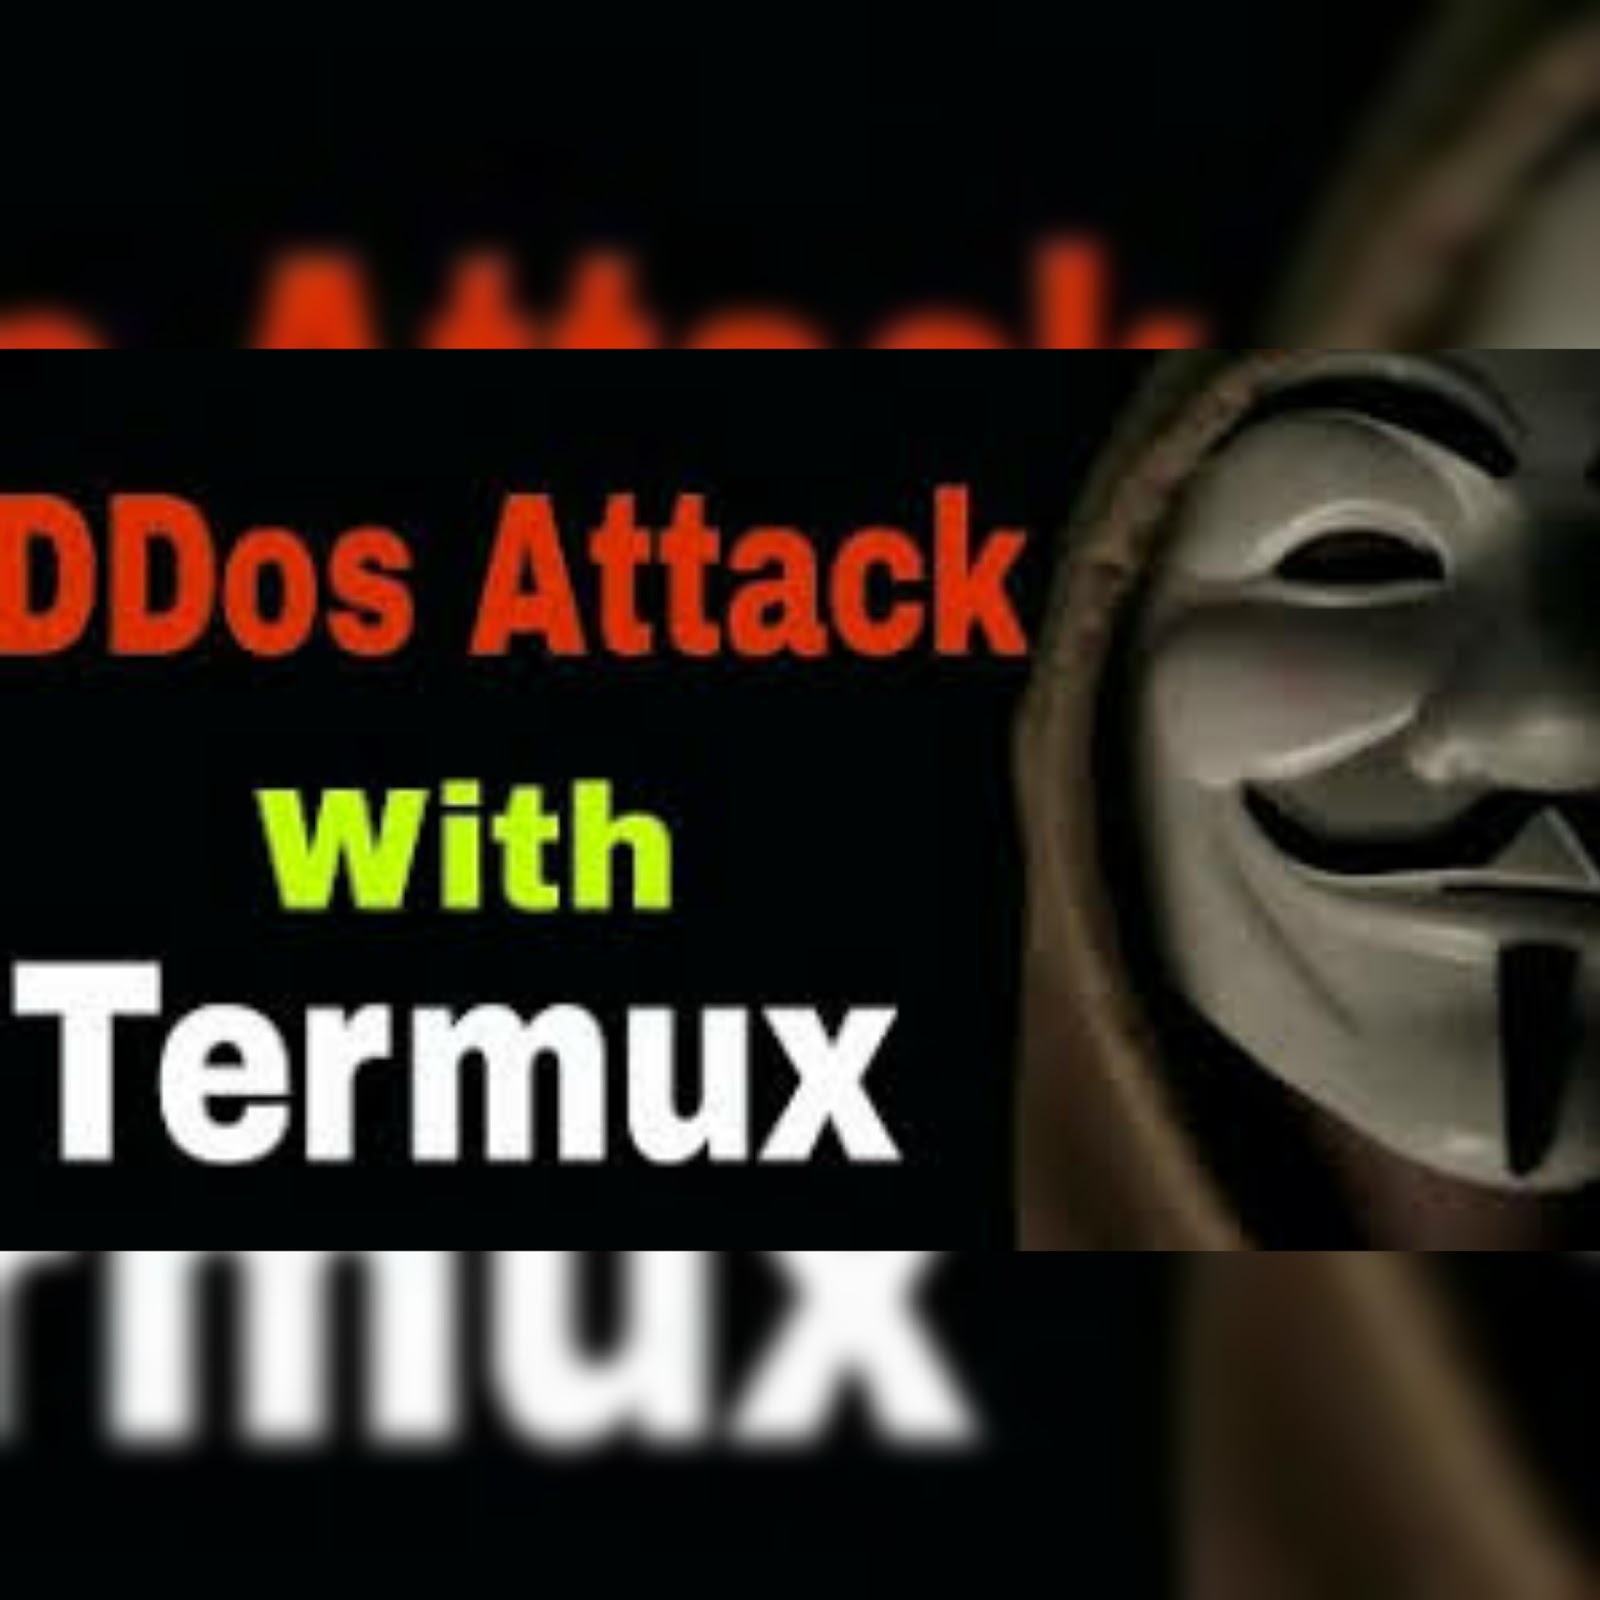 DDoS Via Termux (Tools Lengkap) - MAU-DOWNLOAD